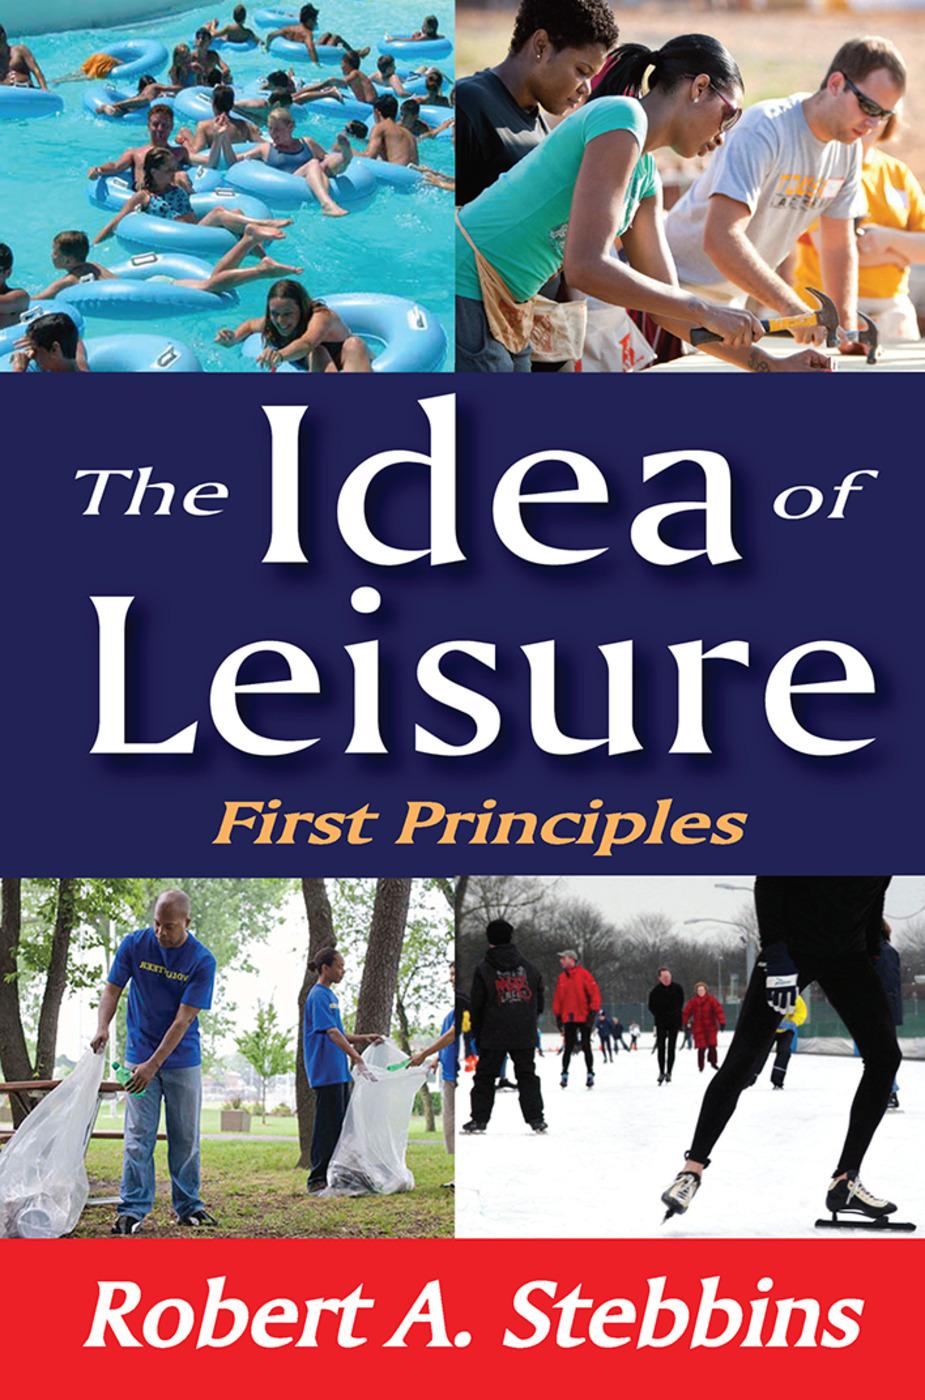 Leisure's Image in the Twenty-First Century